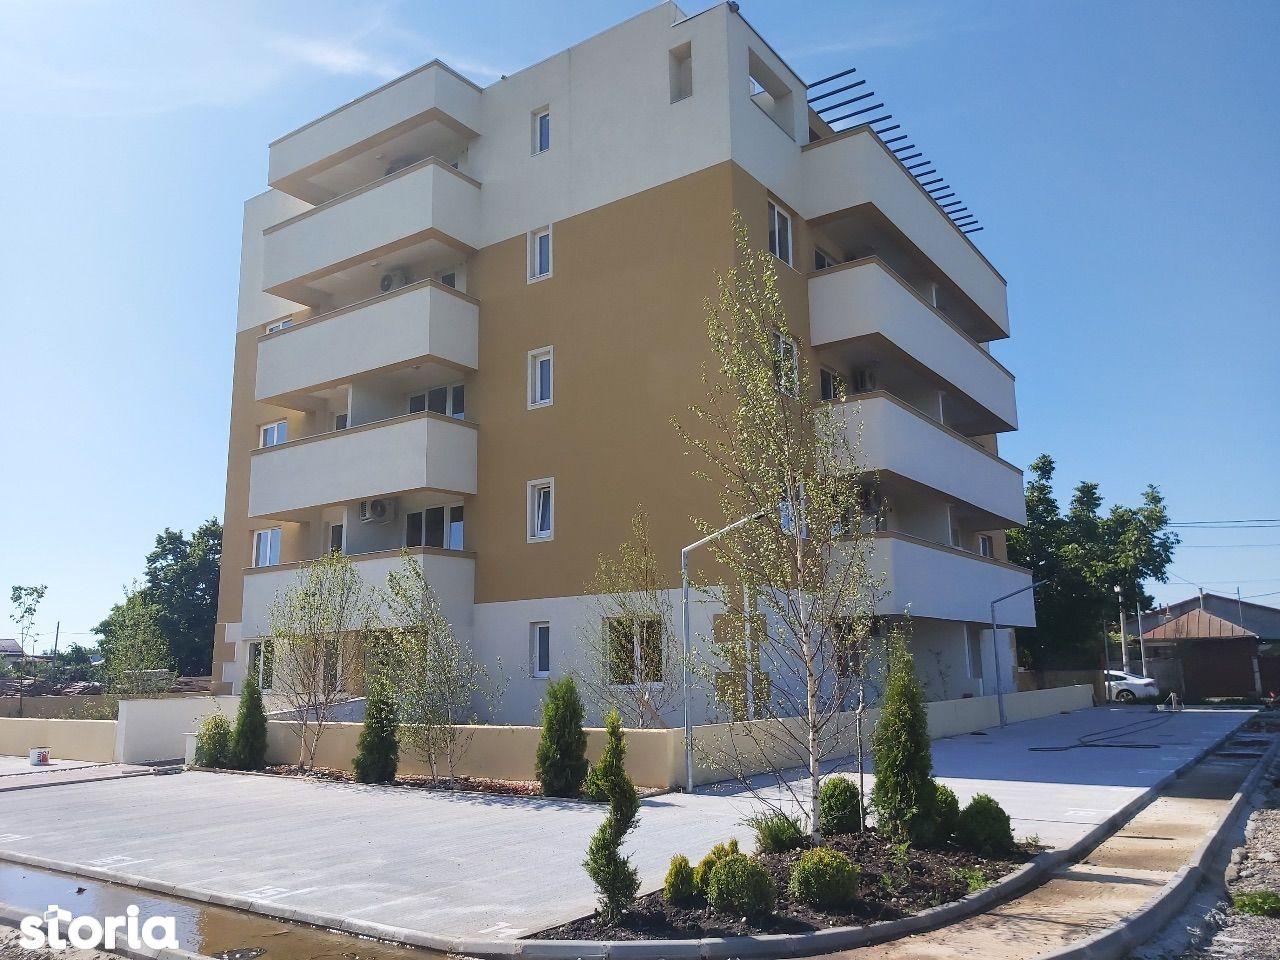 ansamblu rezidential - Aristos Residence